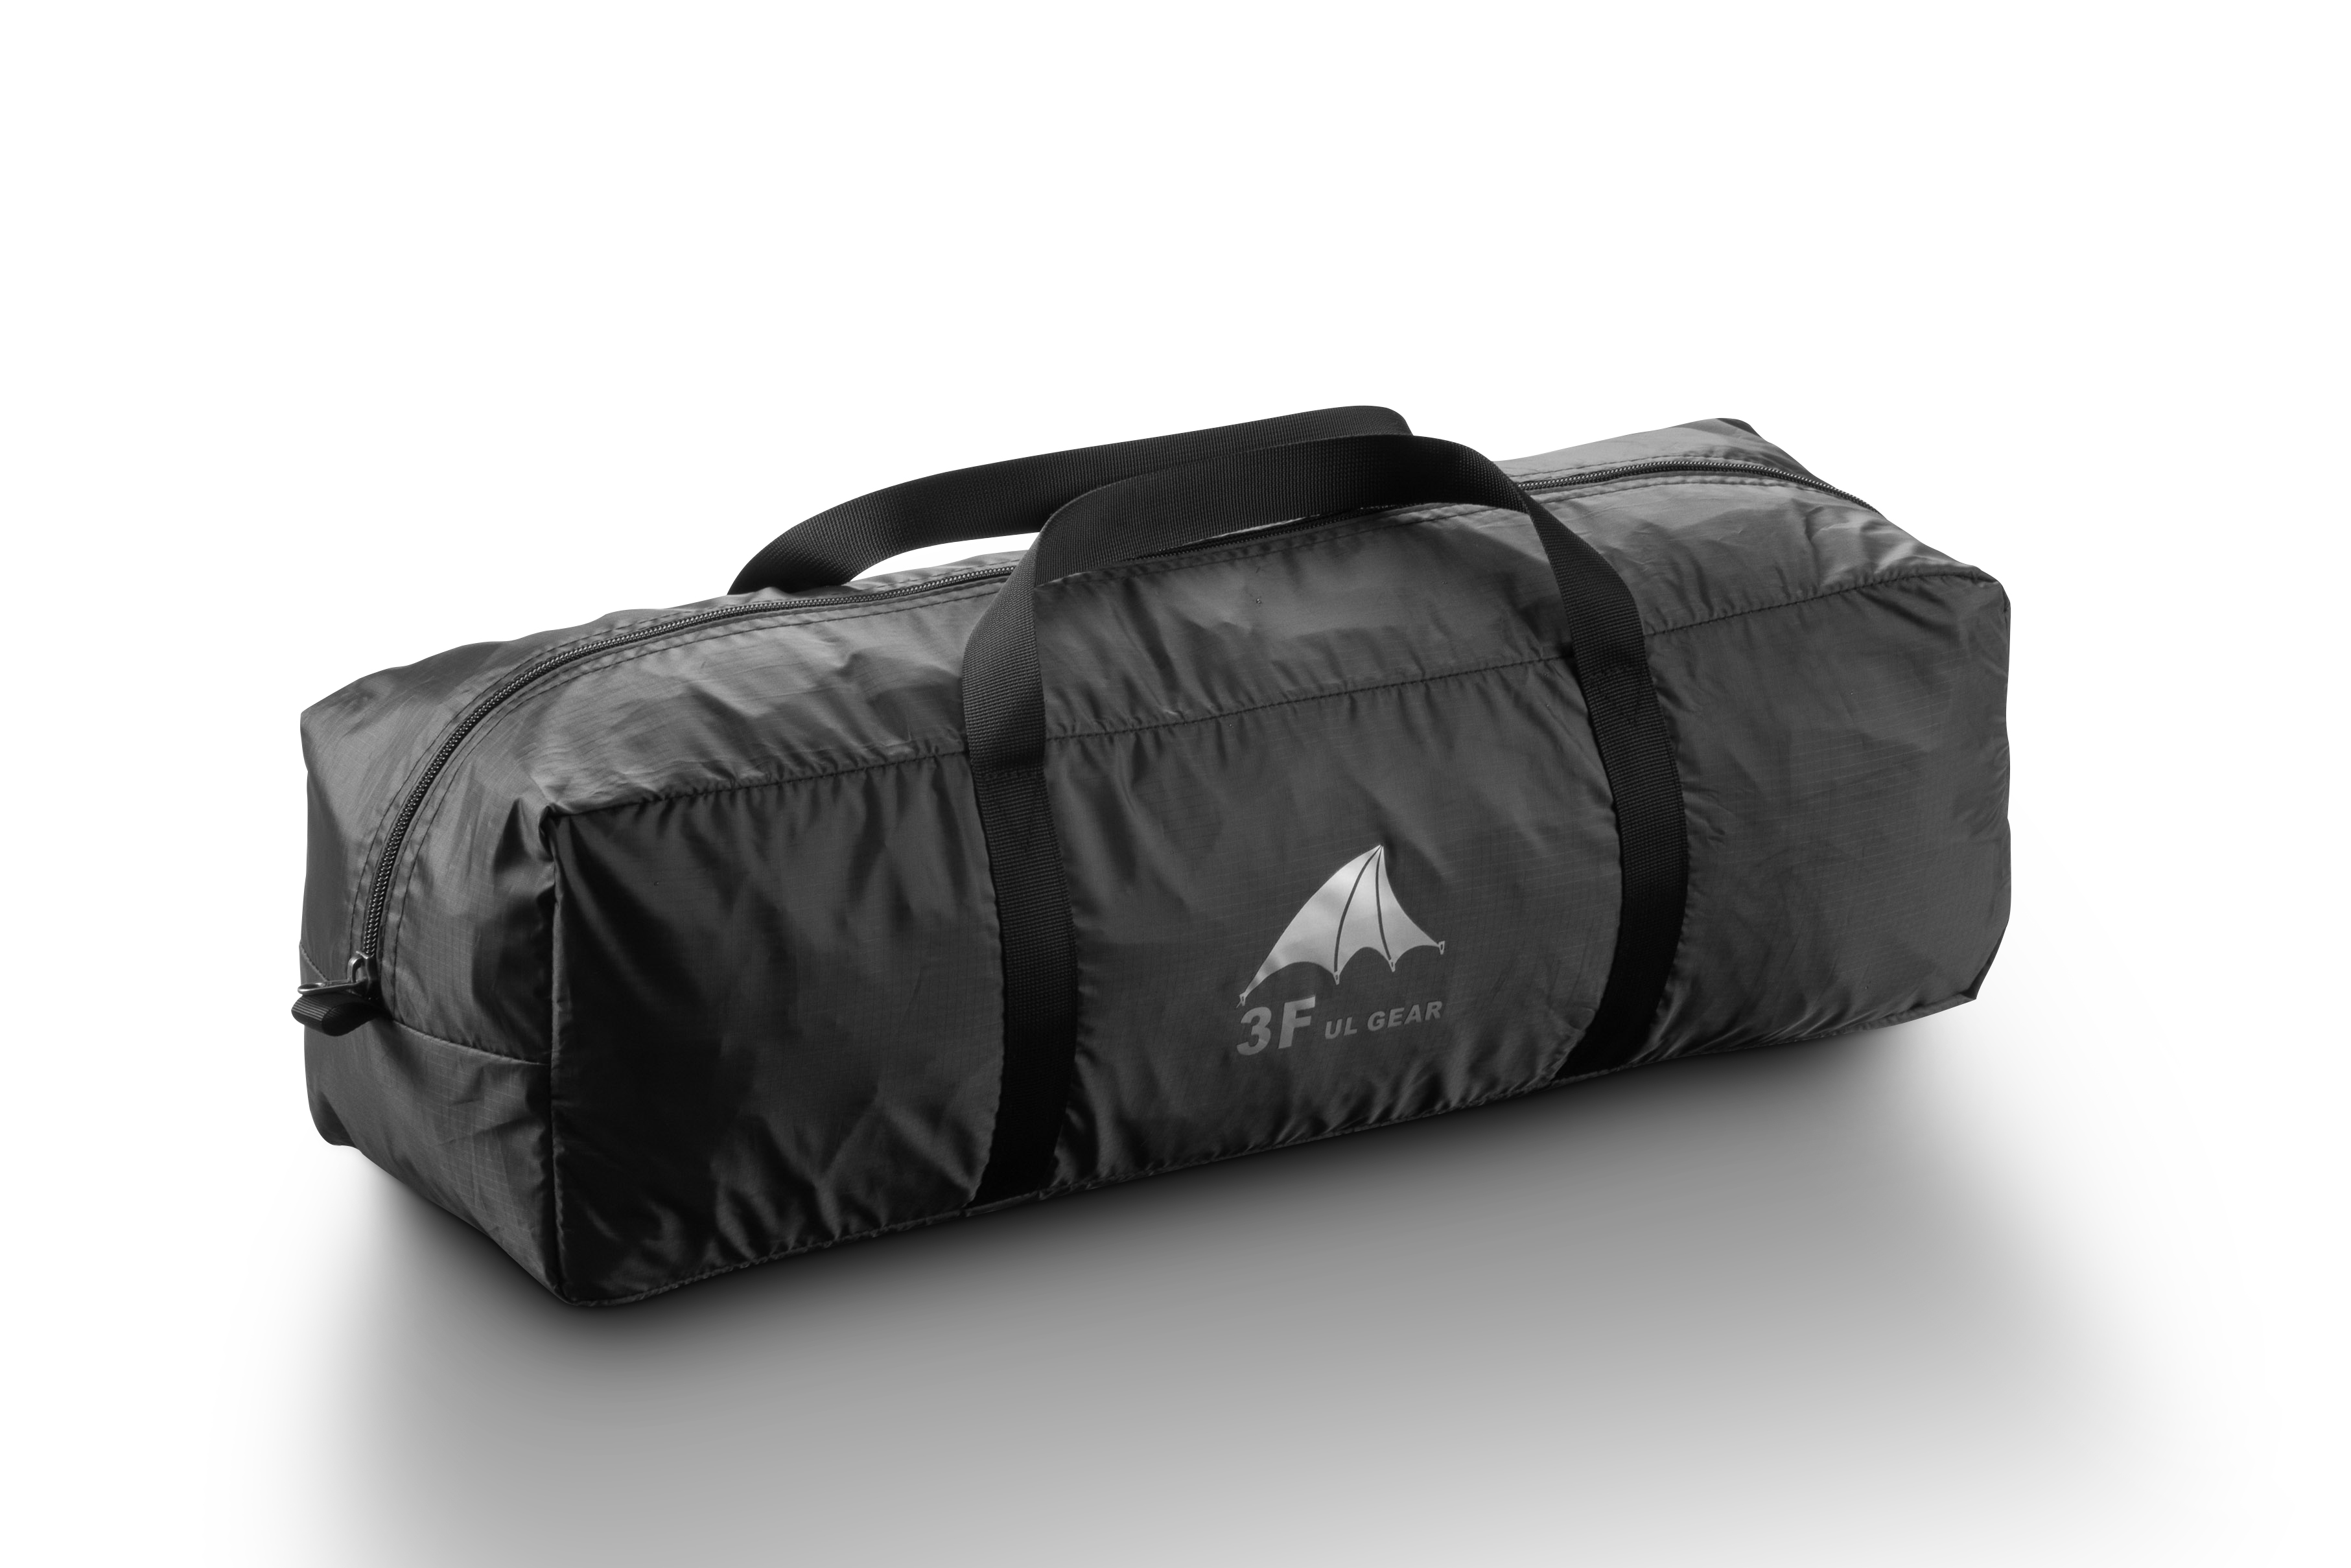 3F UL GEAR Outdoor Tent Storage Bag Large Capacity Wear-resistant Travel Bag Handbag Carrying Bag Picnic Bag